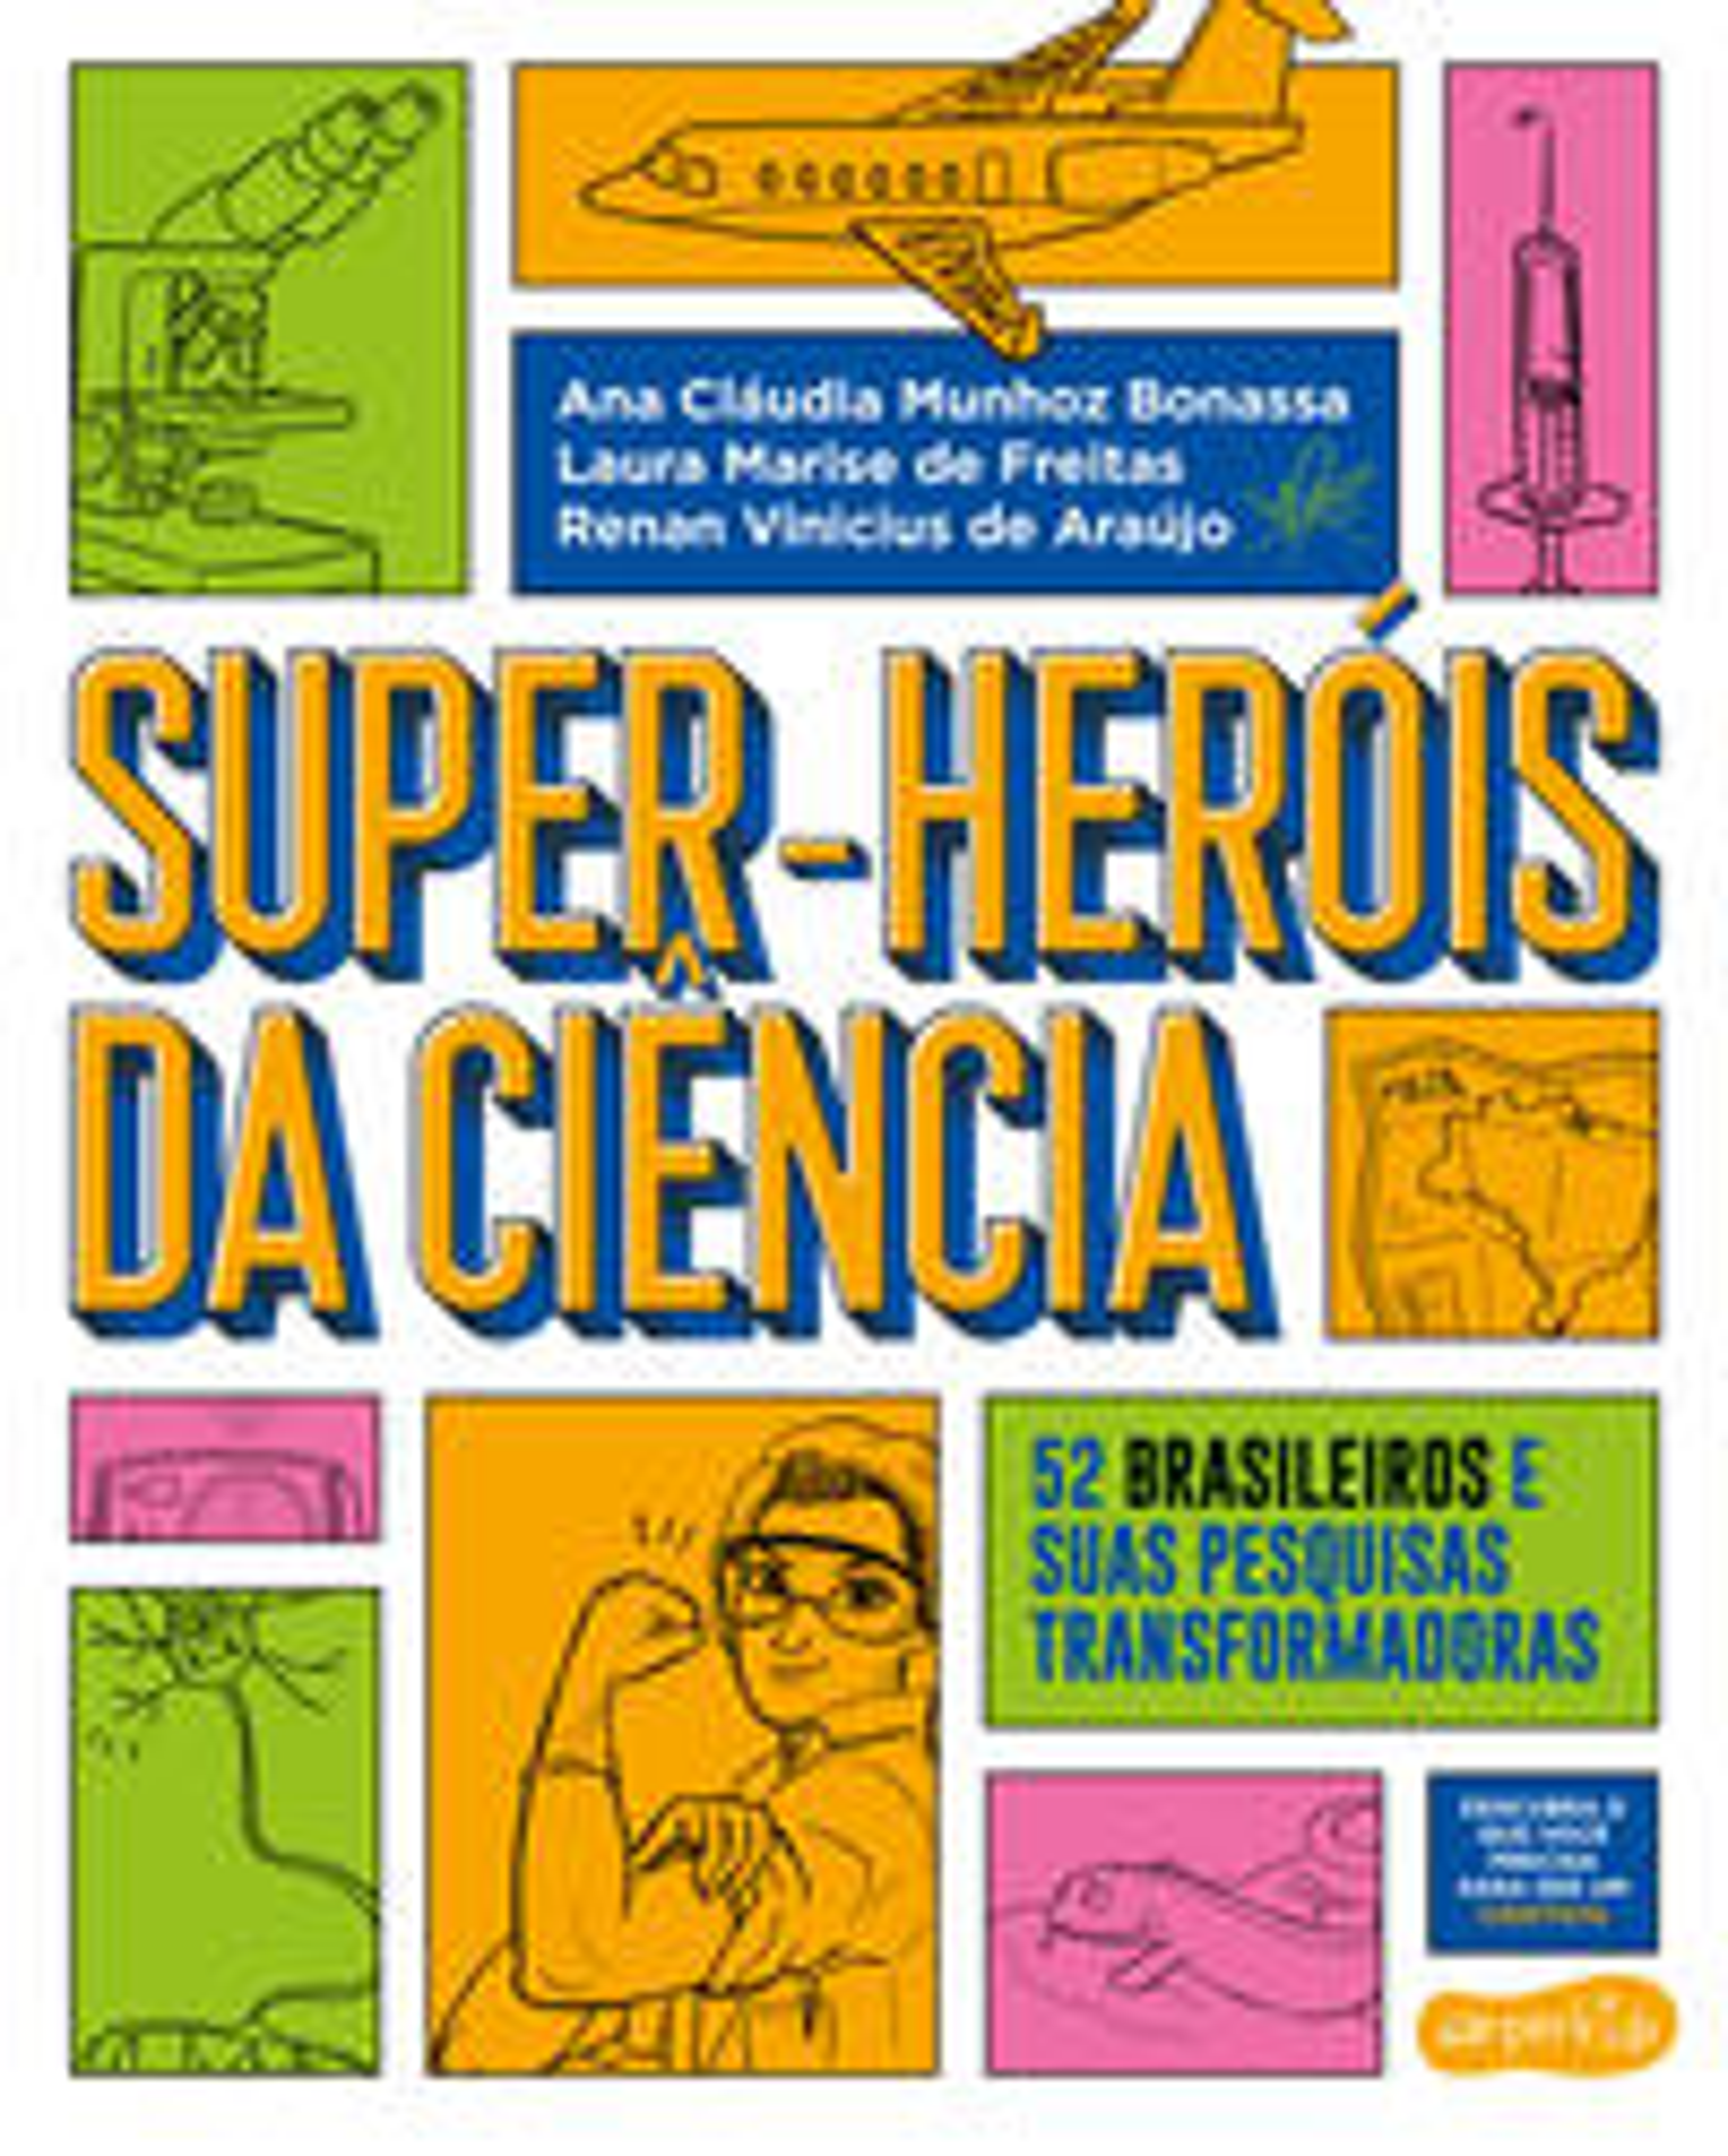 SUPER-HEROIS DA CIENCIA